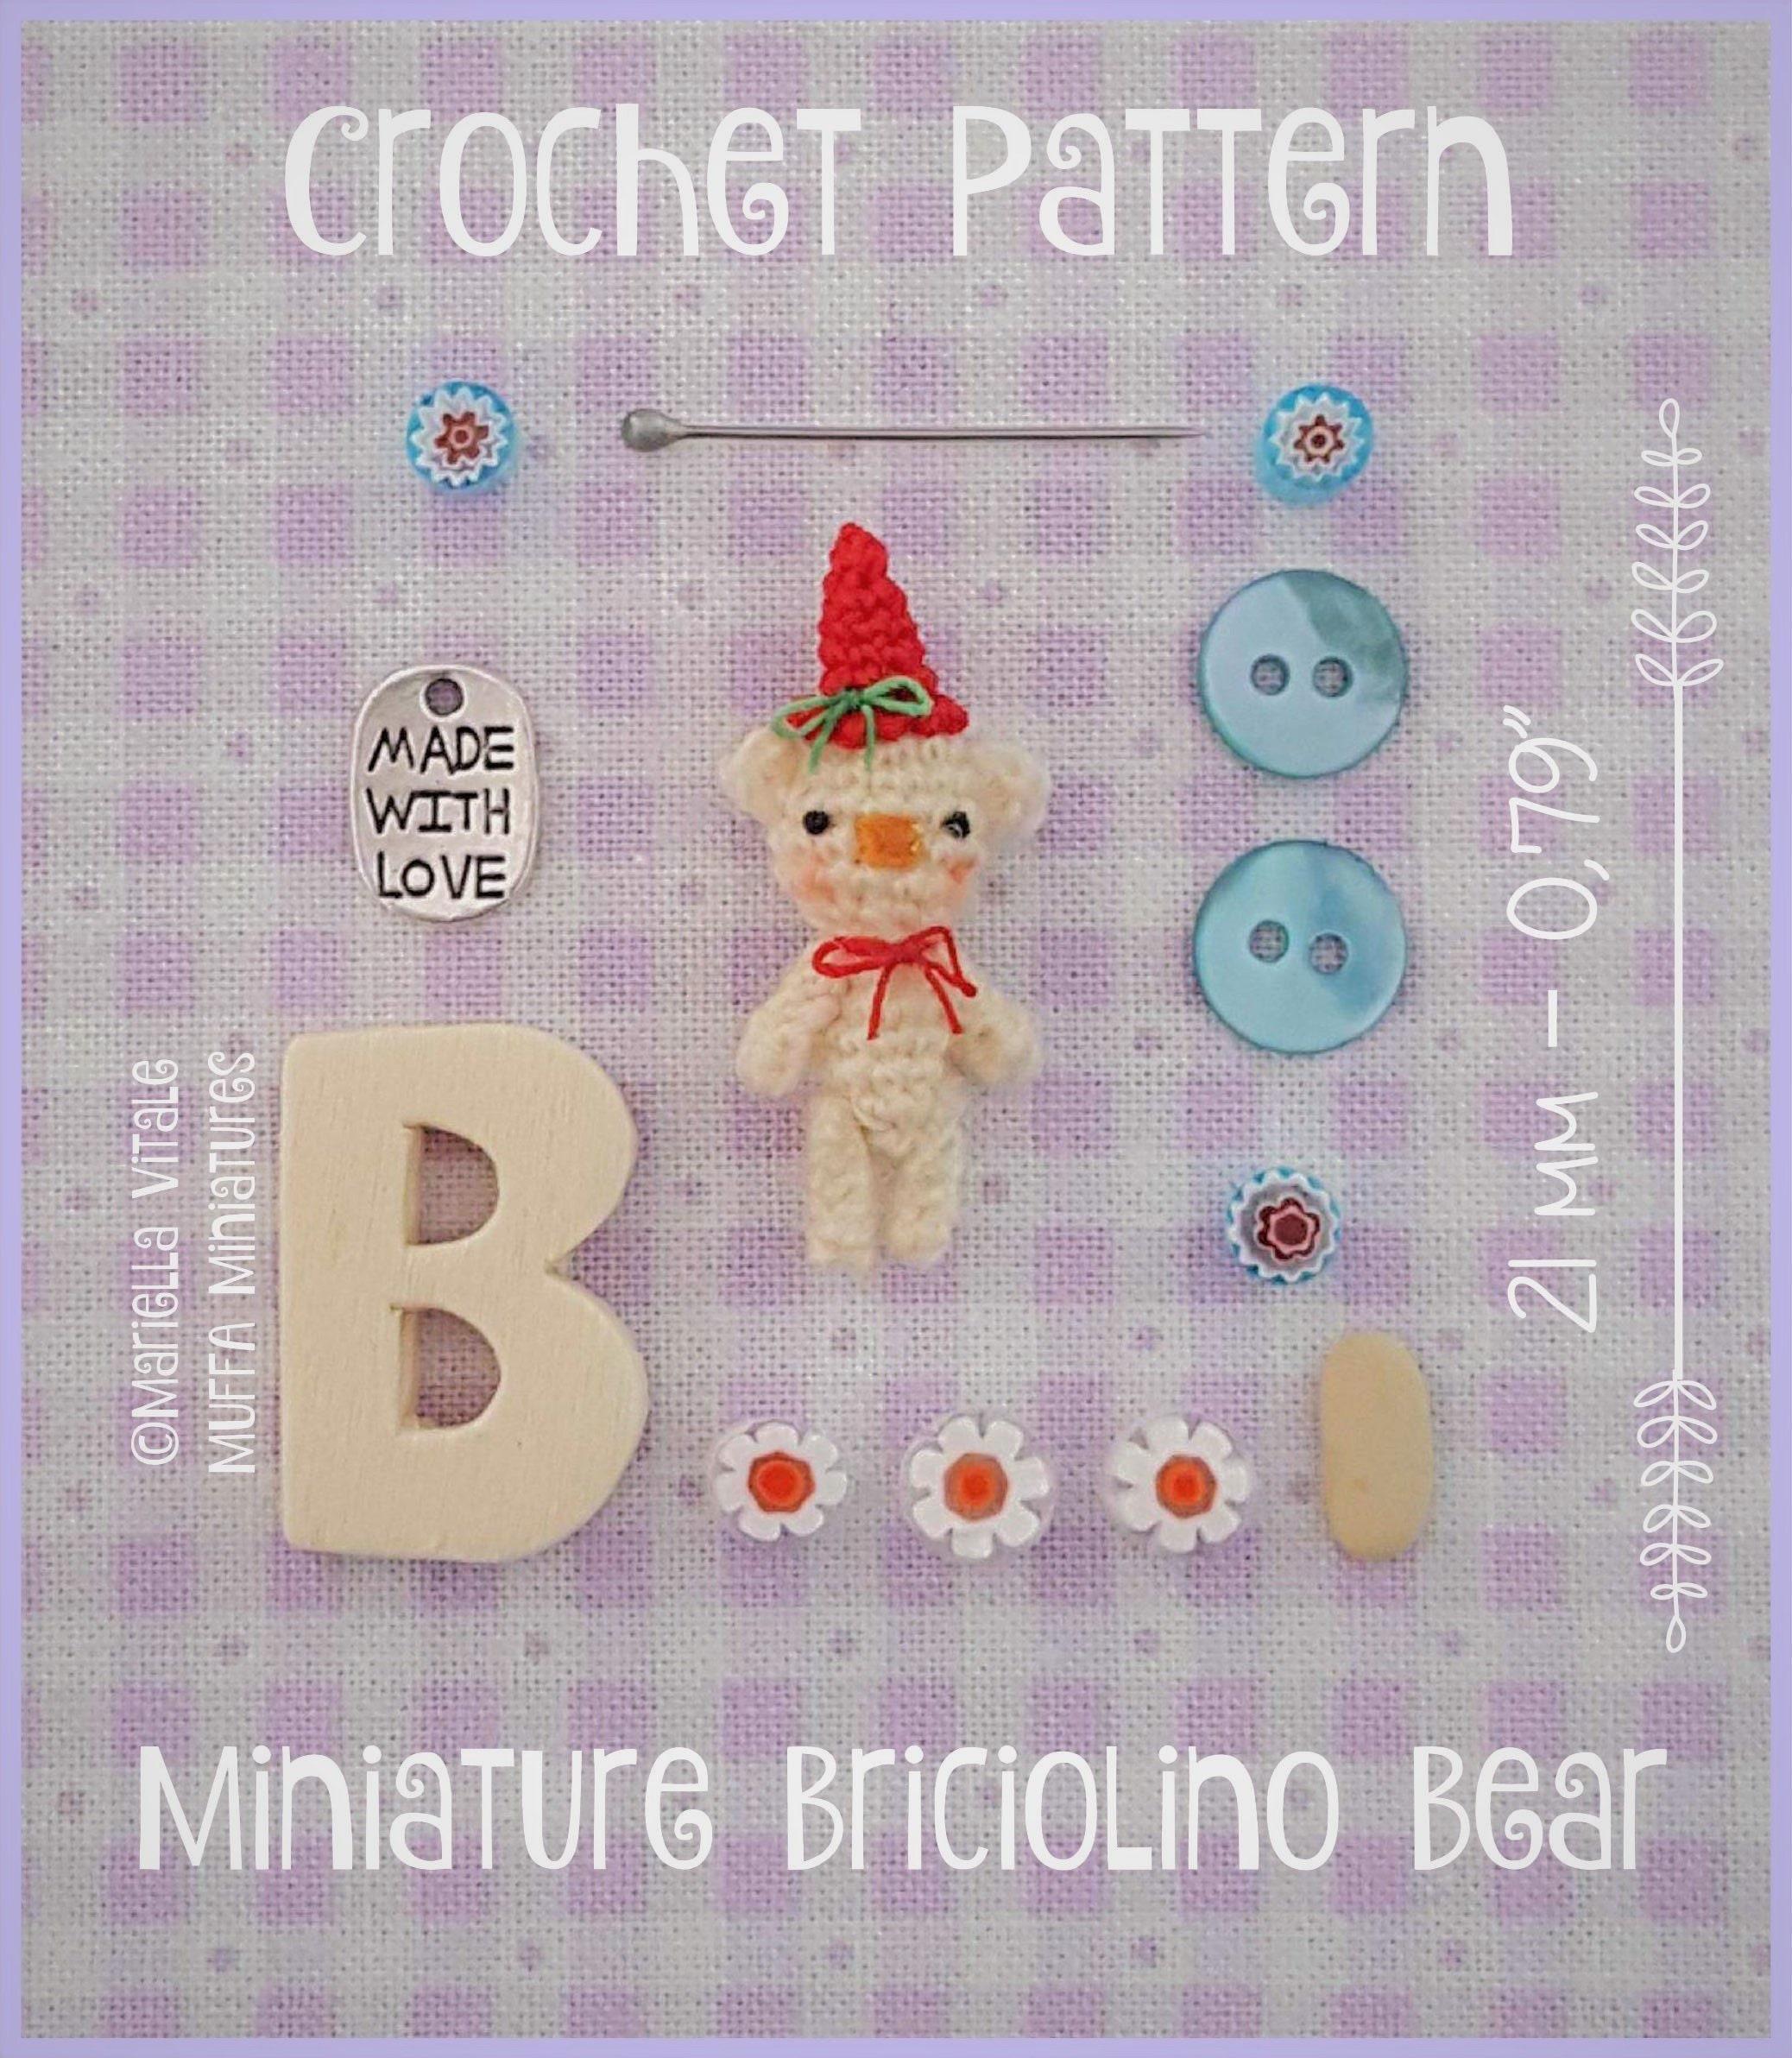 PDF,PATTERN,-,Crochet,Miniature,Briciolino,Bear,Amigurumi,Tutorial,Supplies,miniature,amigurumi,pattern,teddy_bear,DIY,bear,crochet,micro_crochet,schema_uncinetto,thread_bear,crochet_bear_pattern